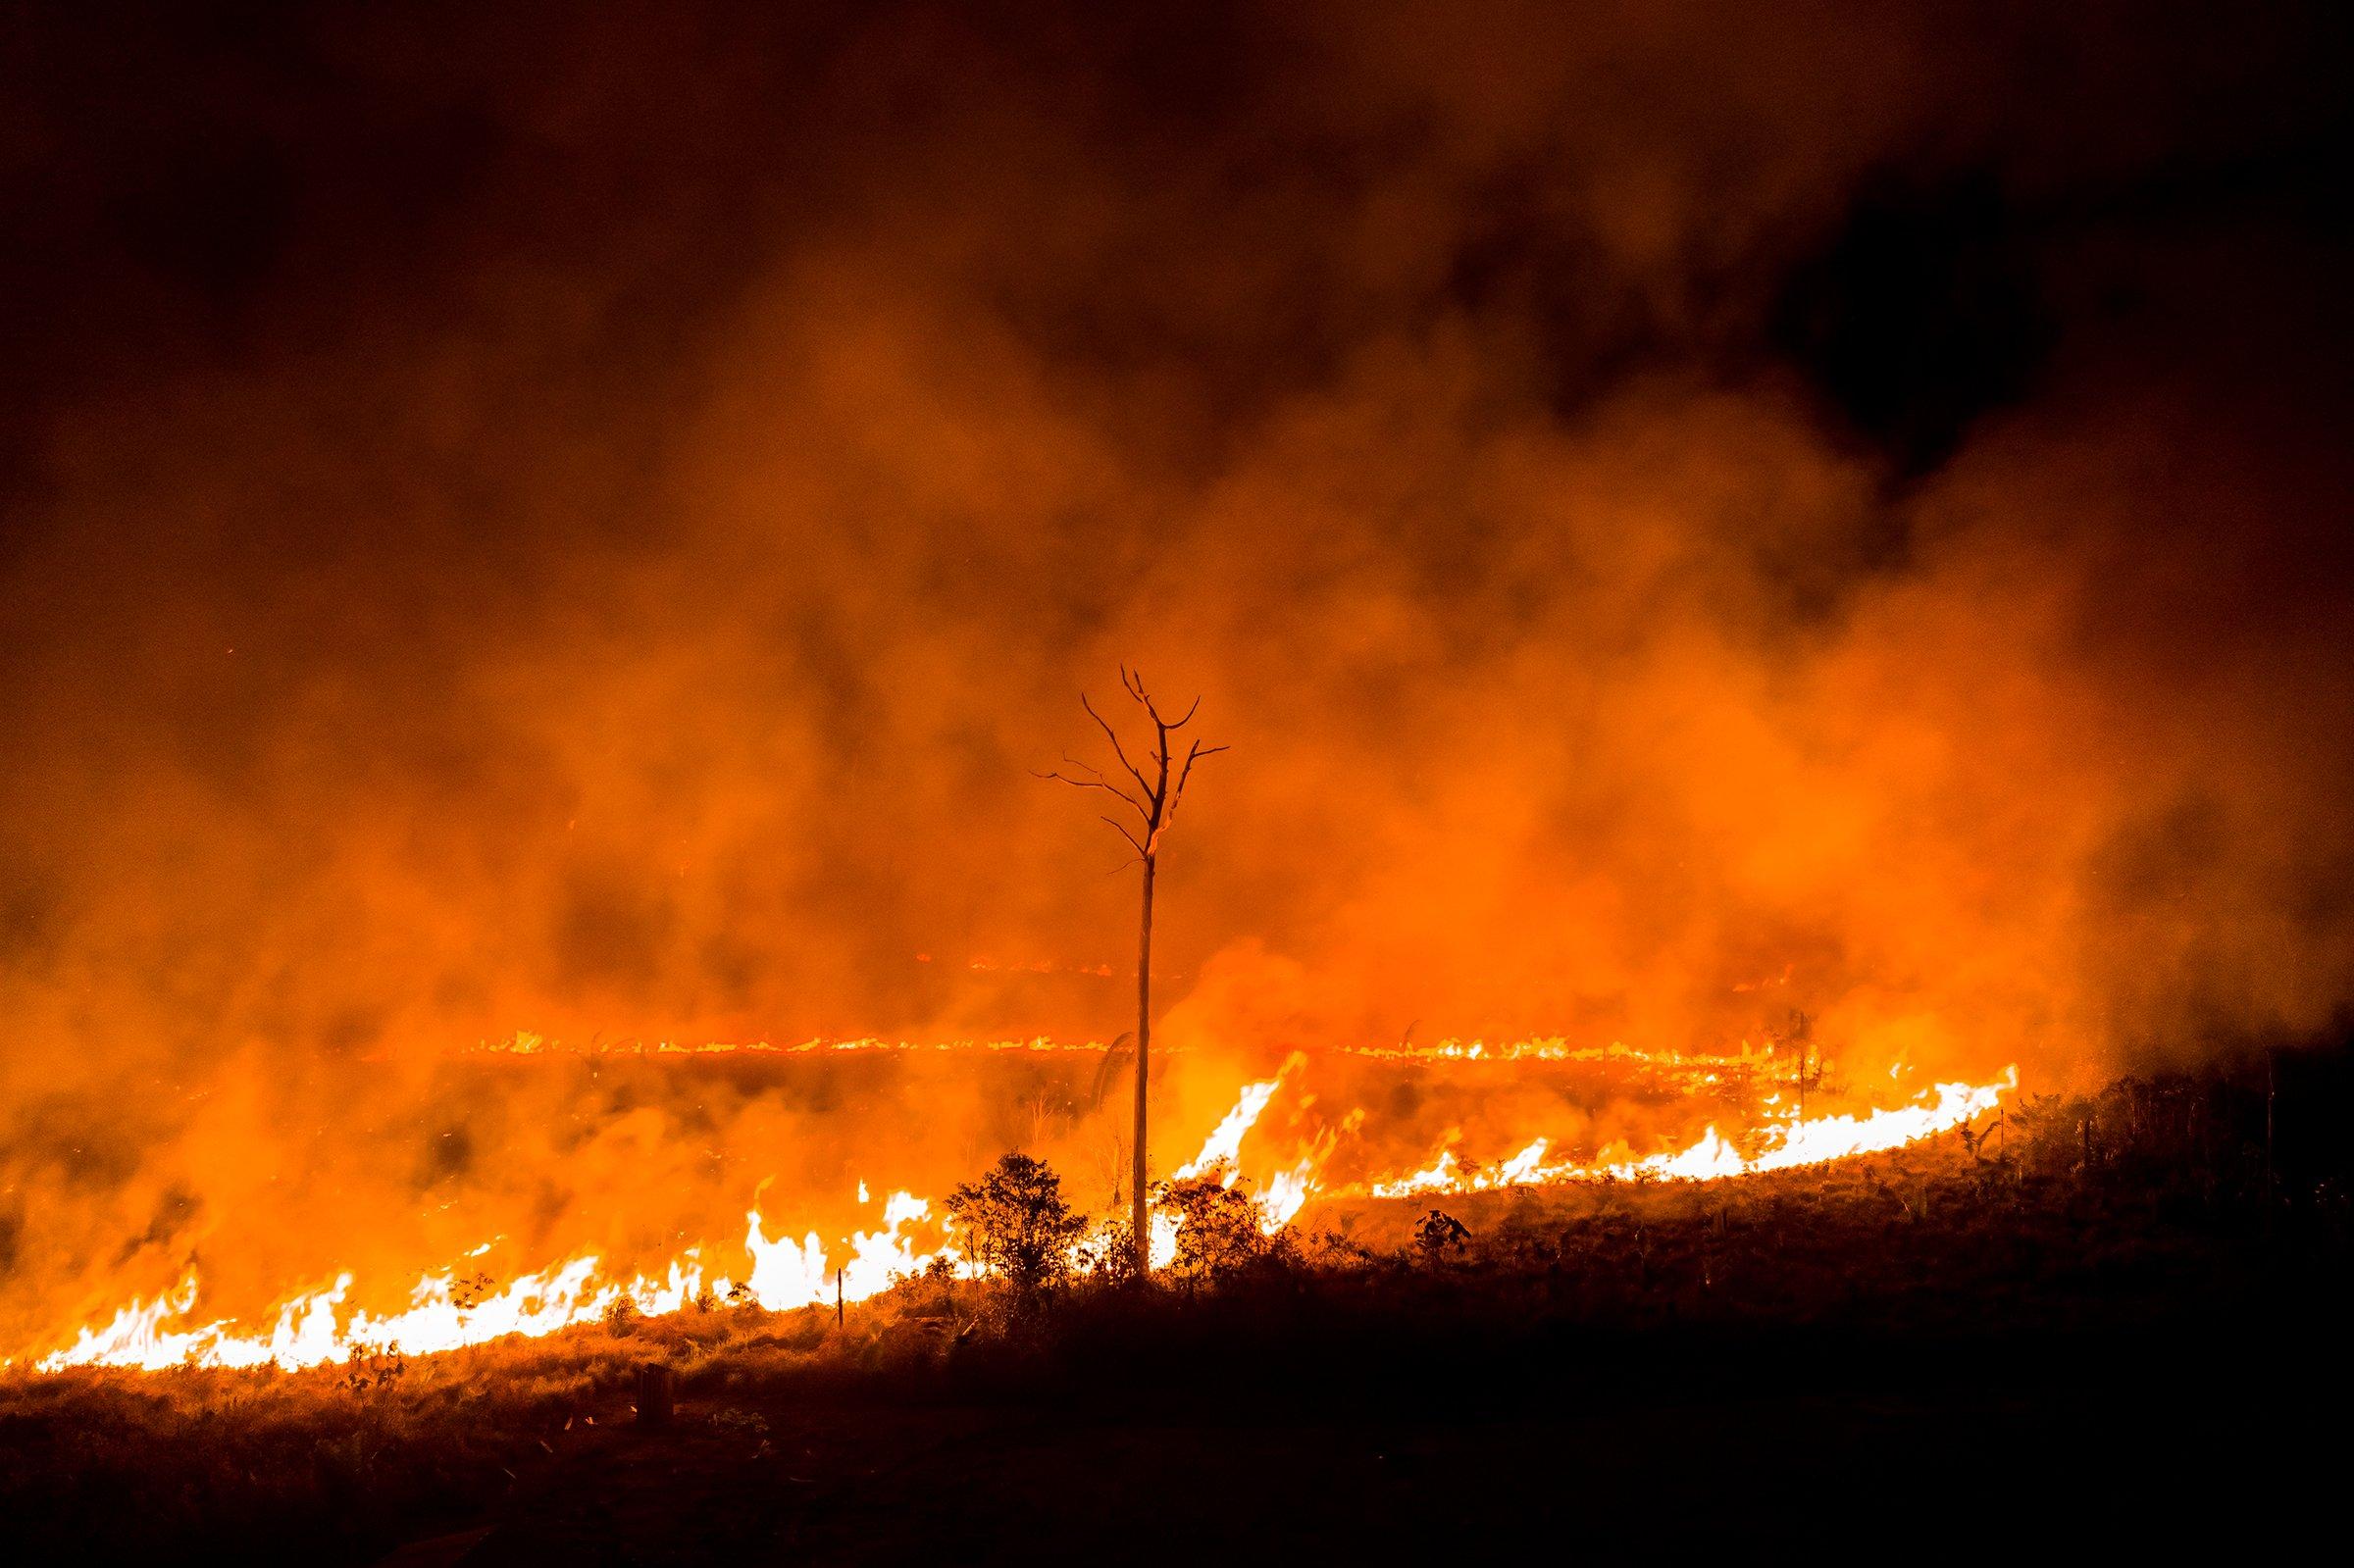 sebastian-liste-amazon-fires-brazil-1